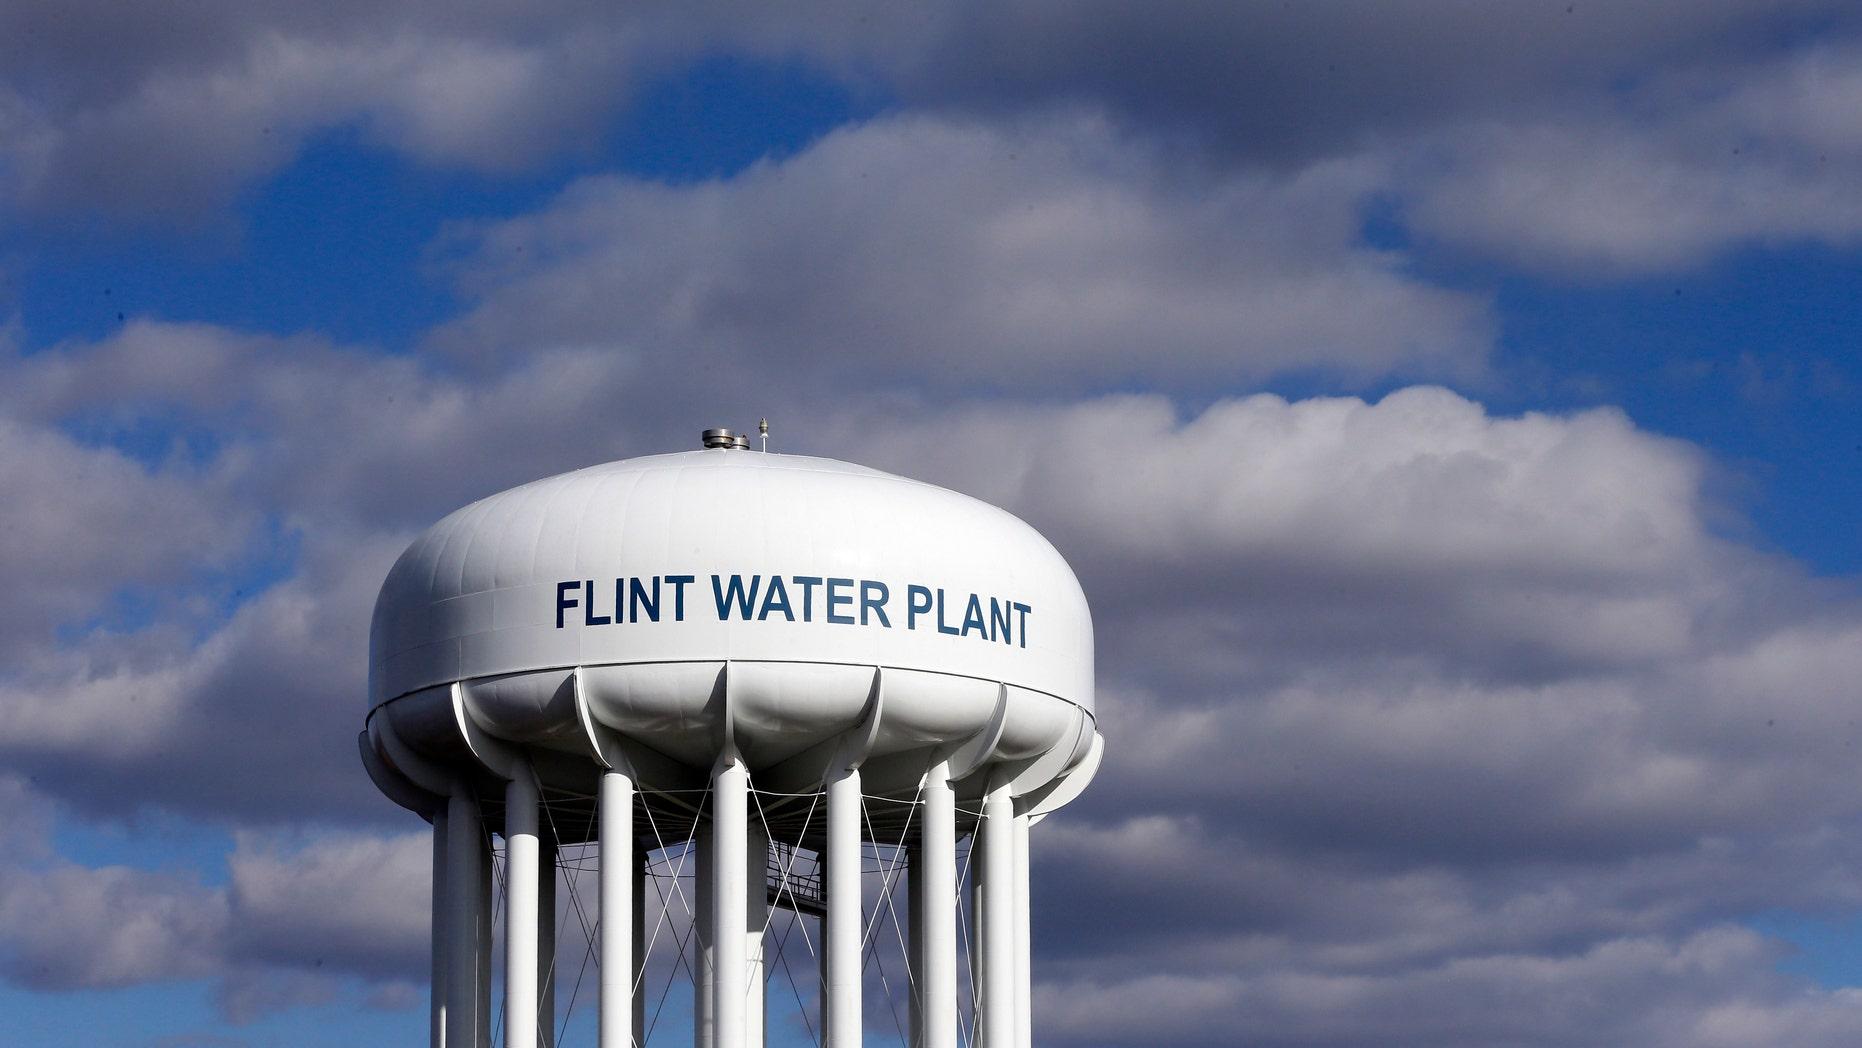 March 21, 2016: The Flint Water Plant water tower is seen in Flint, Mich.